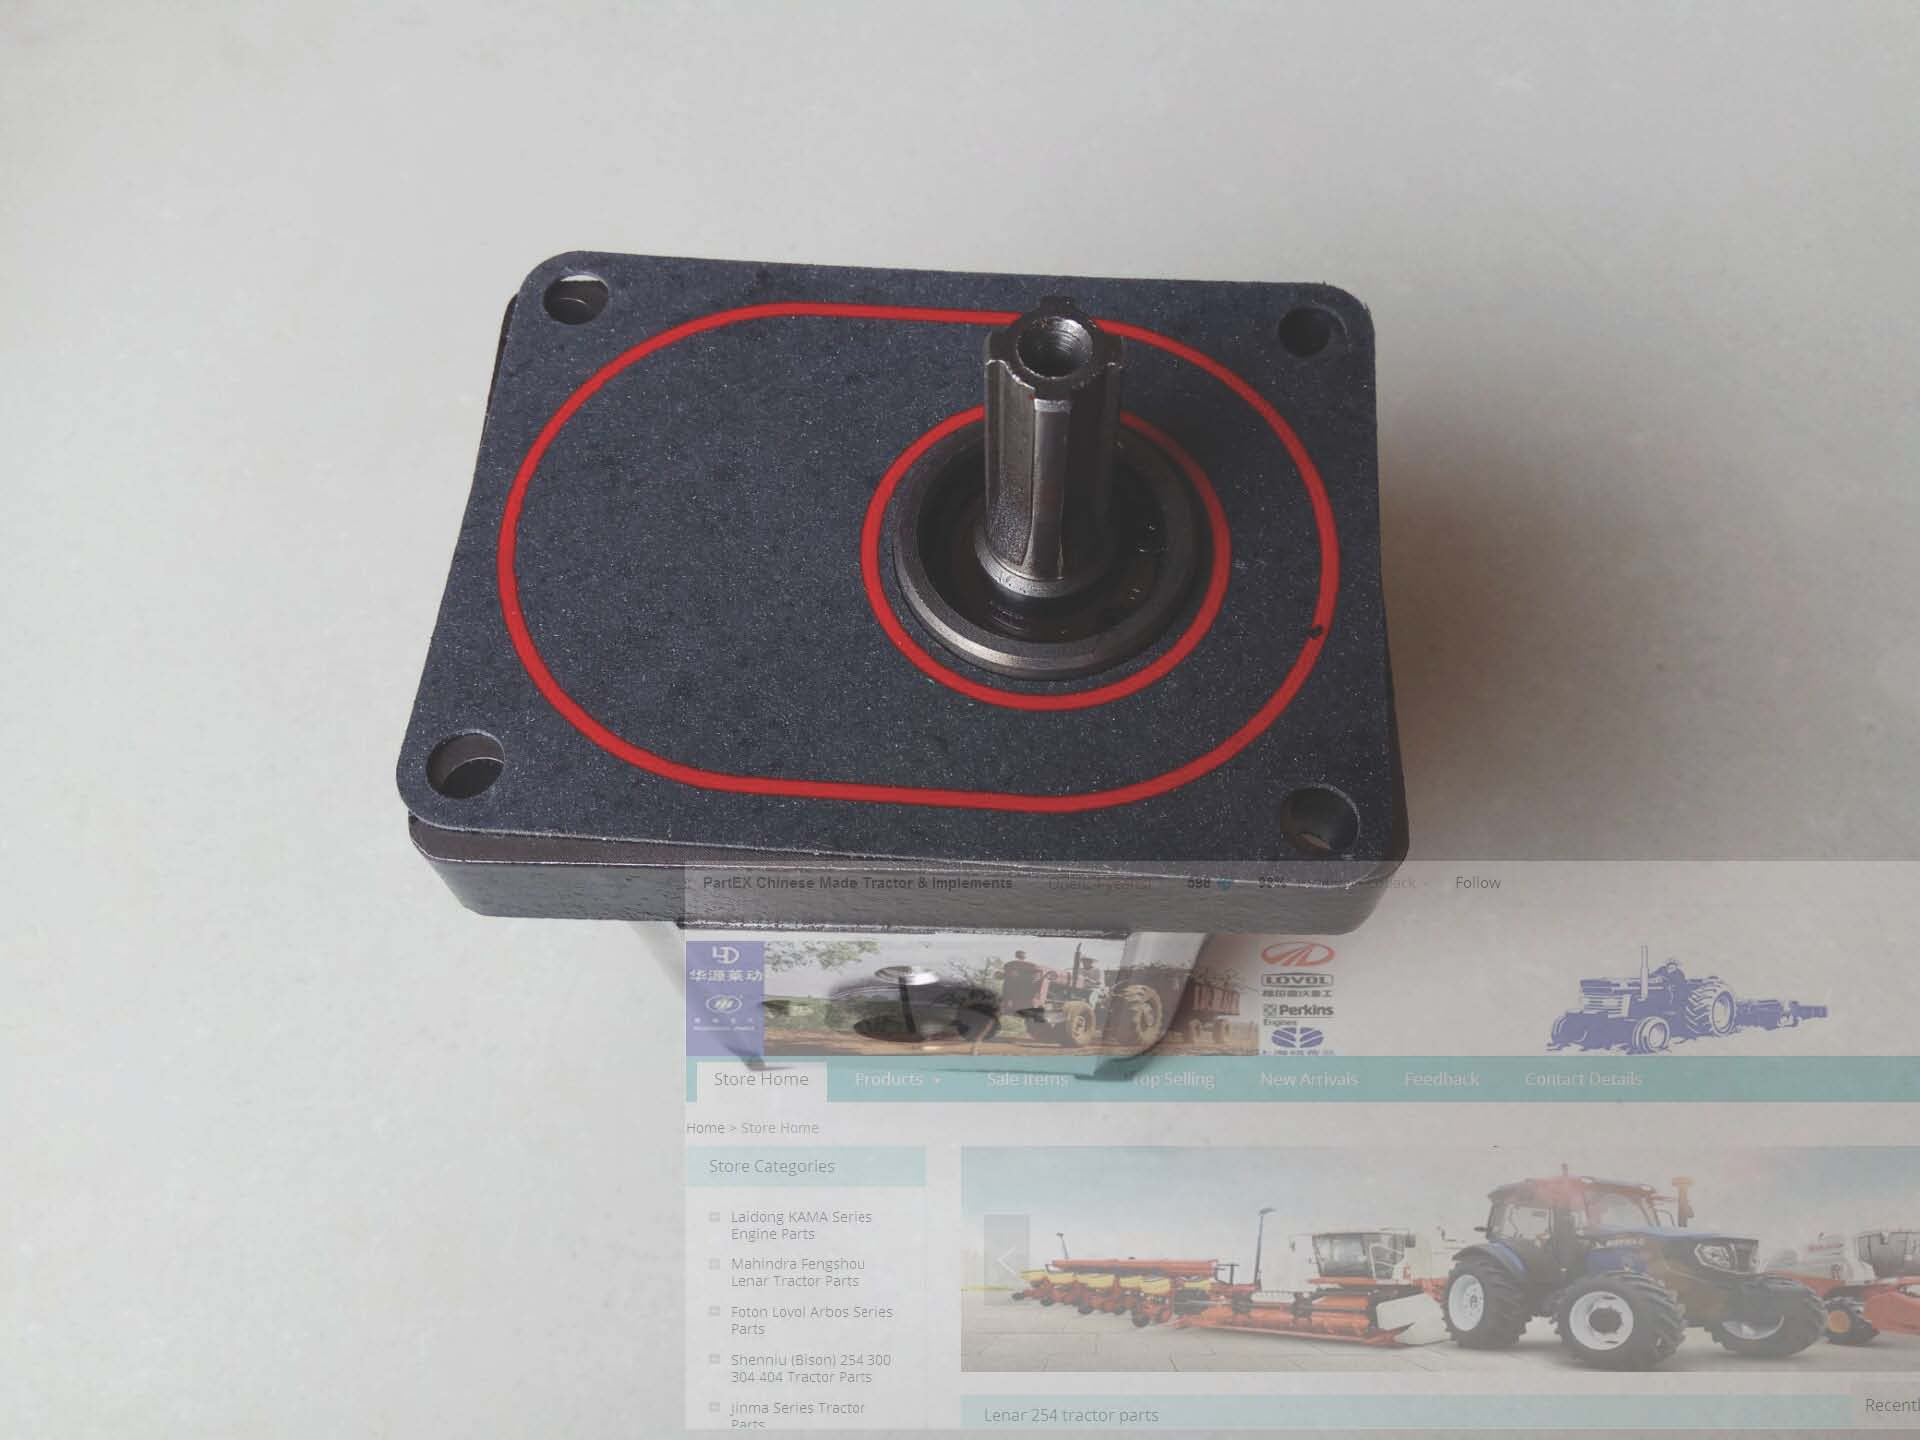 Bomba de engranajes para tractor Foton Lovol FT704 724 824, número de pieza FT700.58D.010